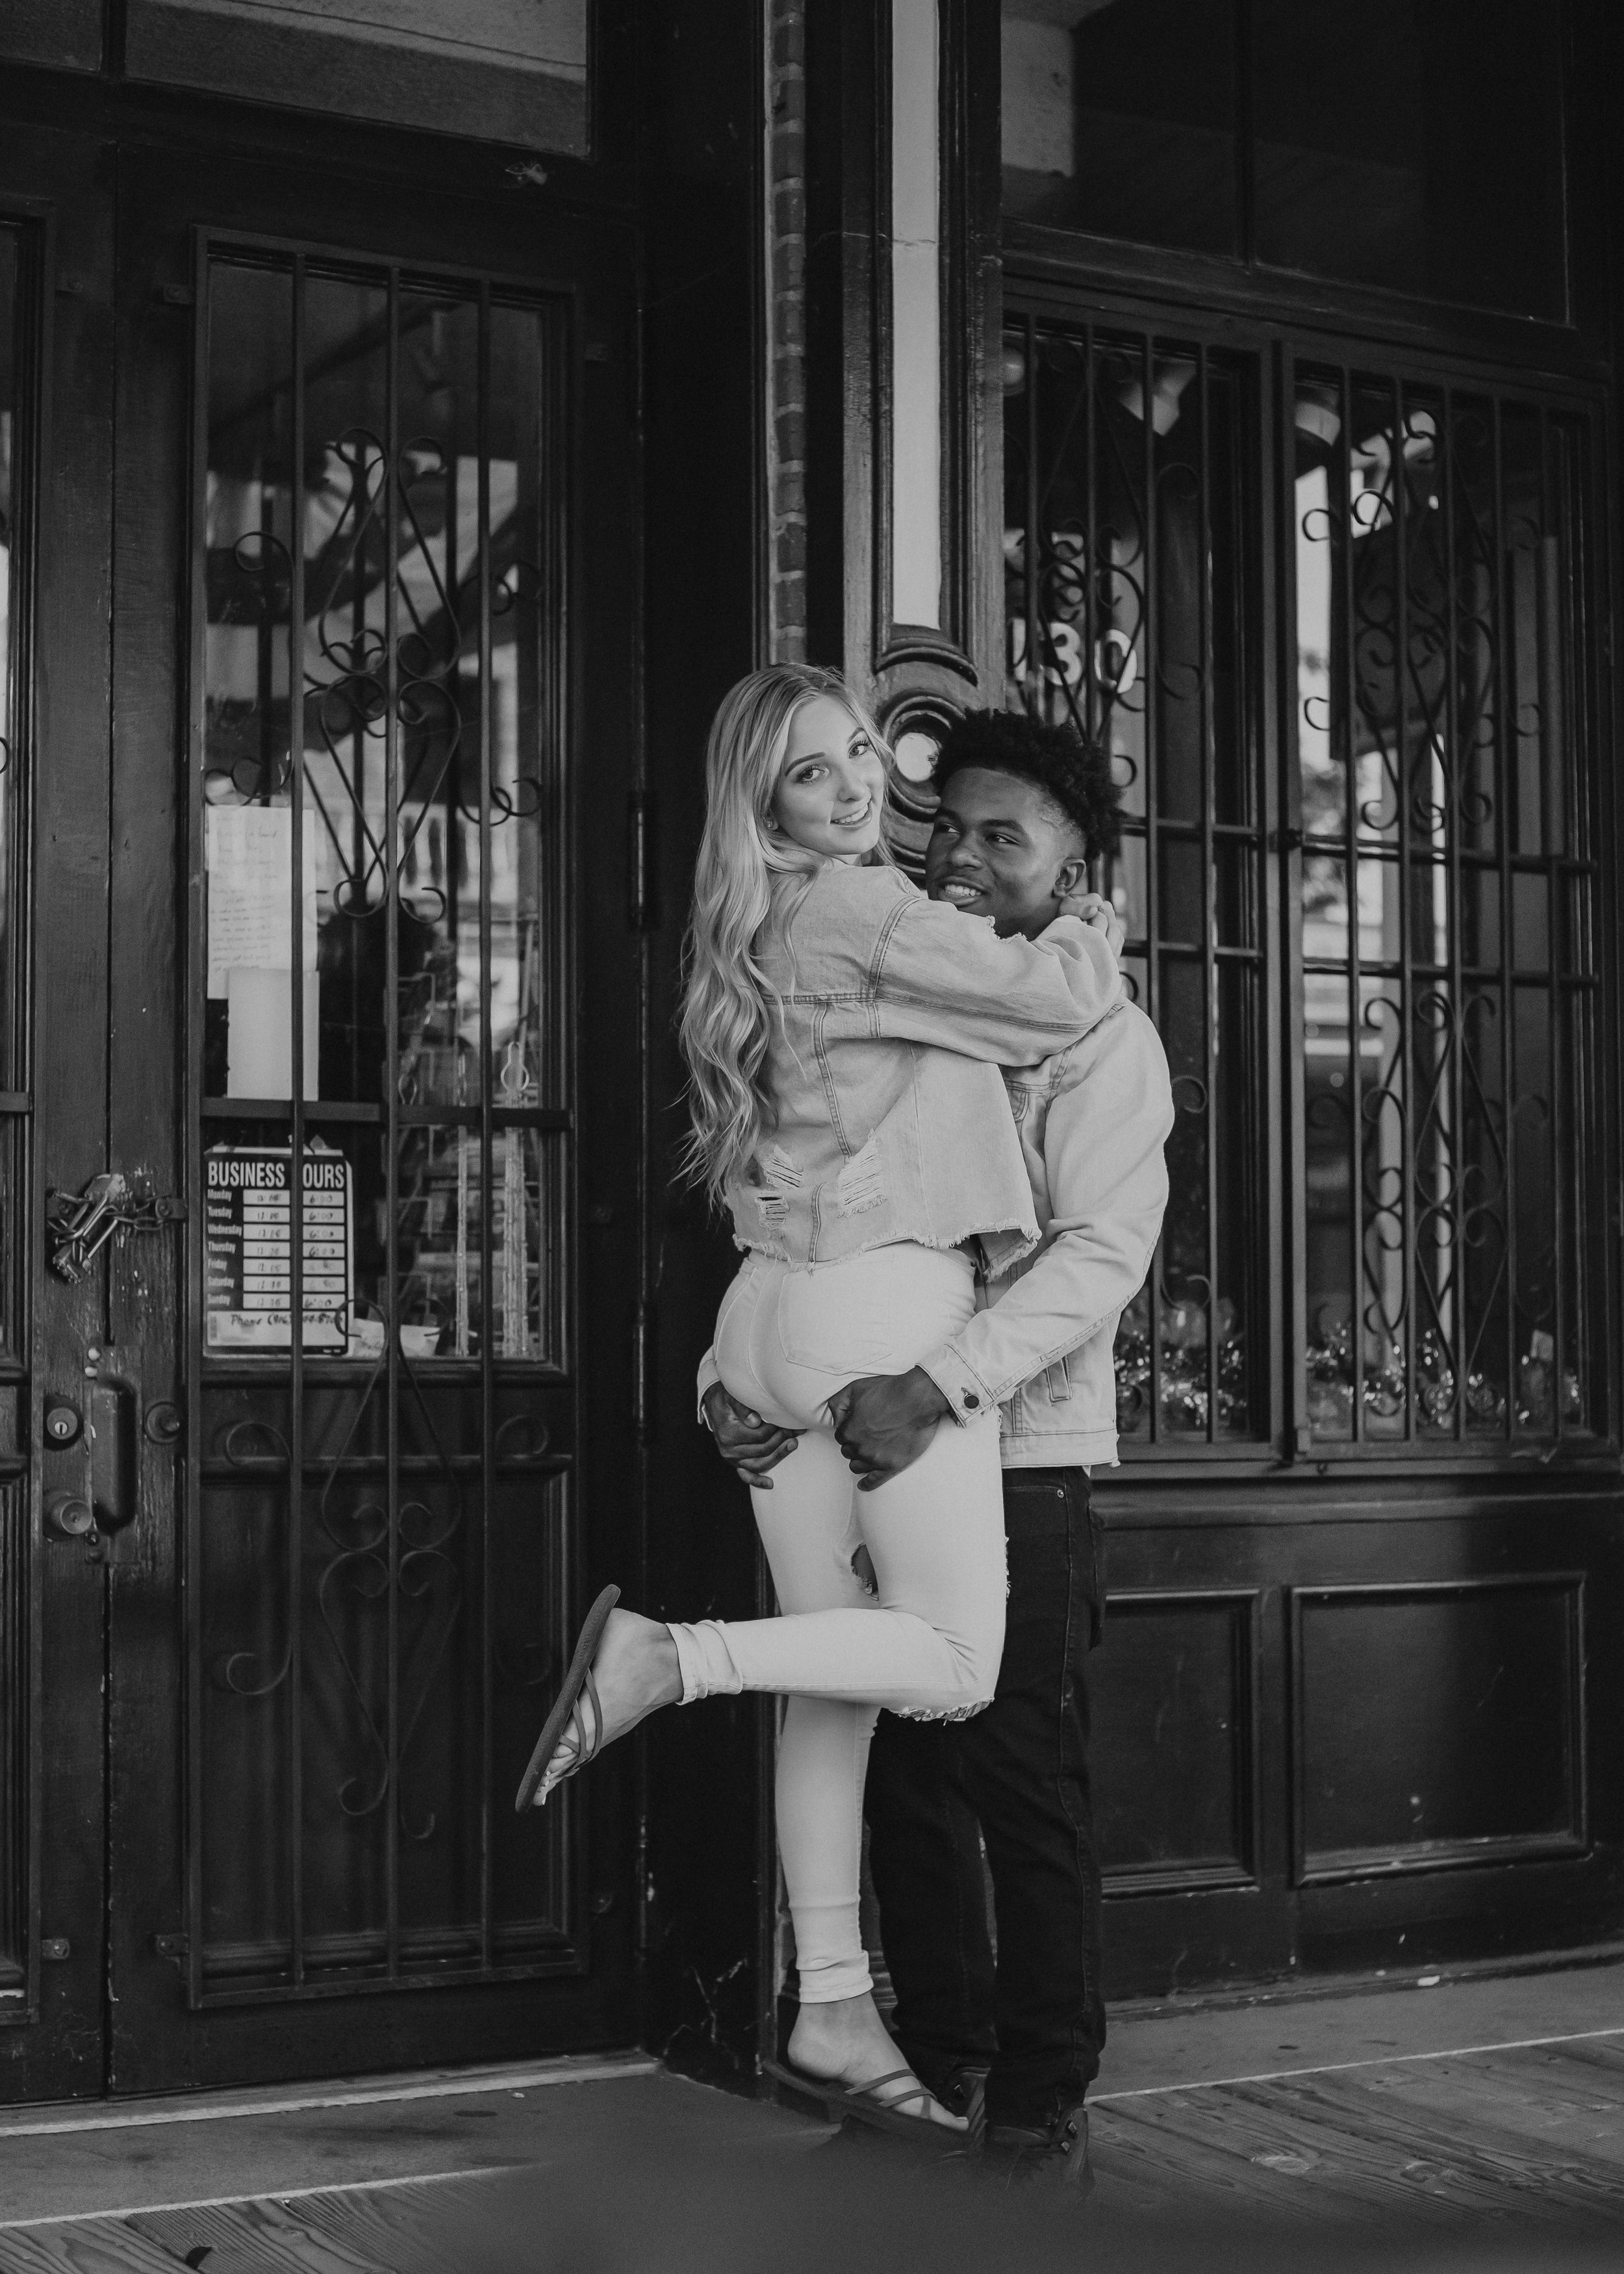 190822_Emma&Terrence_54-2.JPG